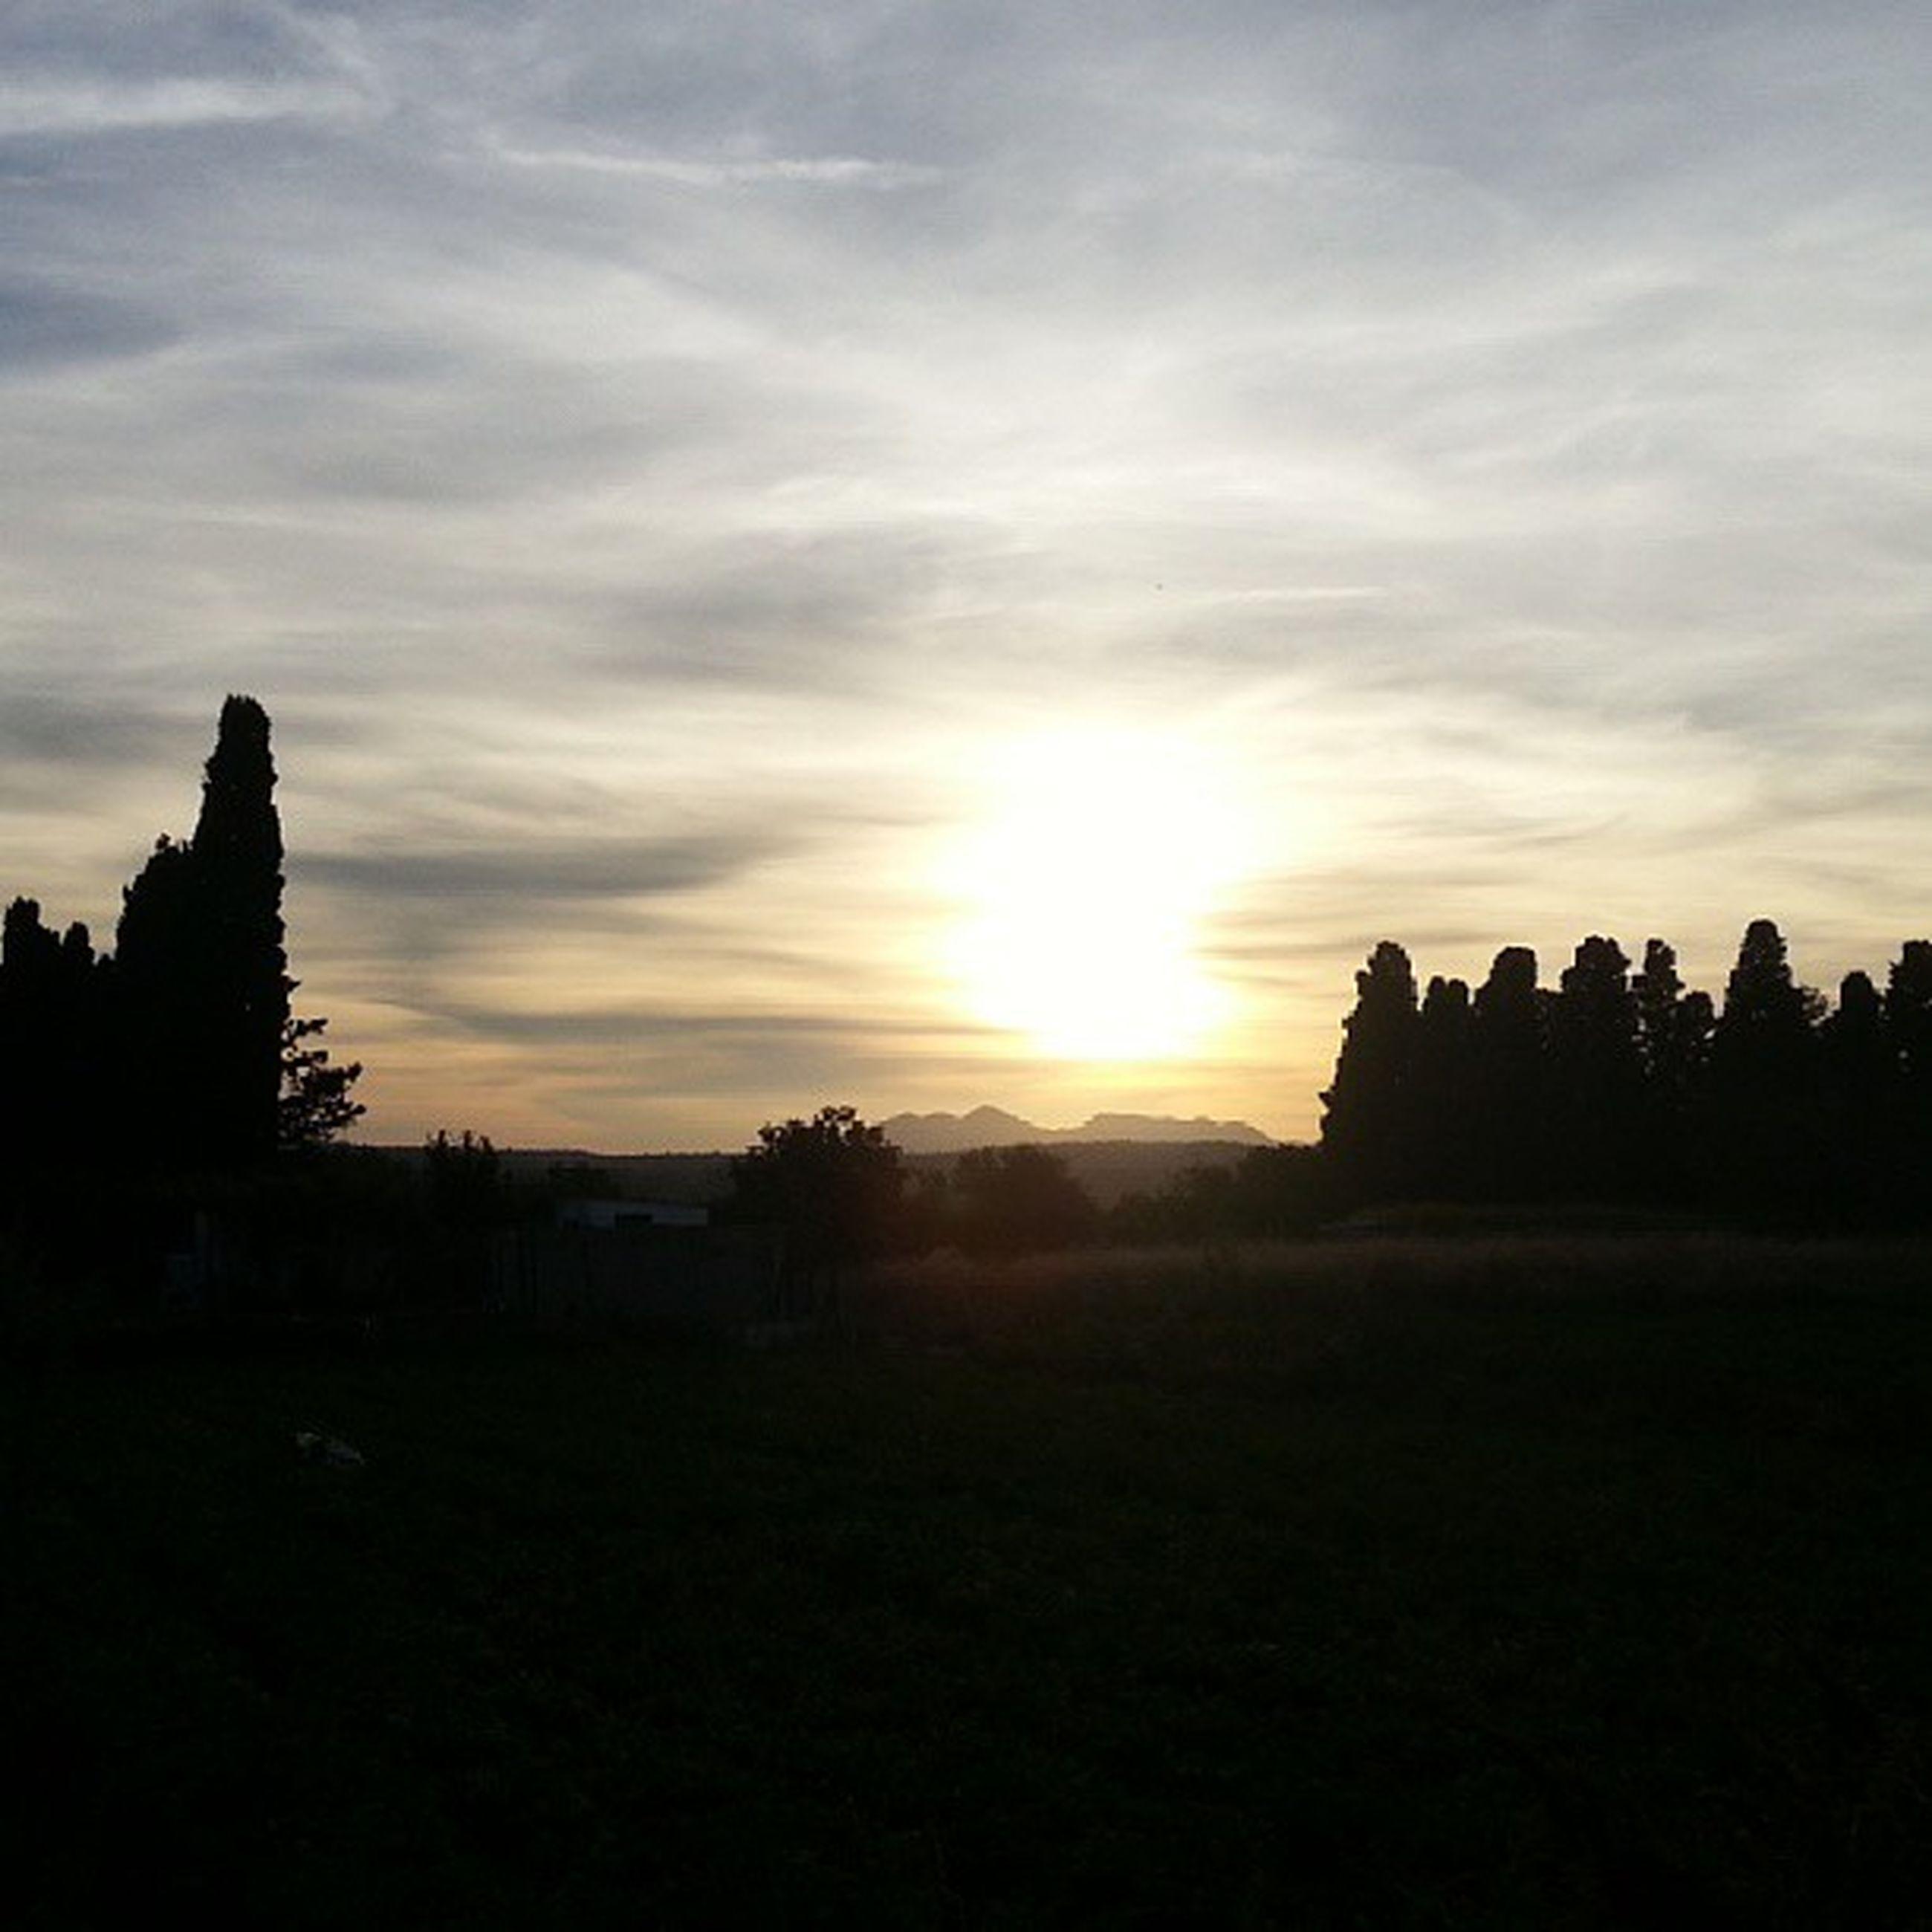 sunset, silhouette, sun, sky, tranquil scene, landscape, scenics, cloud - sky, beauty in nature, tranquility, sunlight, sunbeam, nature, field, tree, idyllic, cloud, outdoors, building exterior, built structure